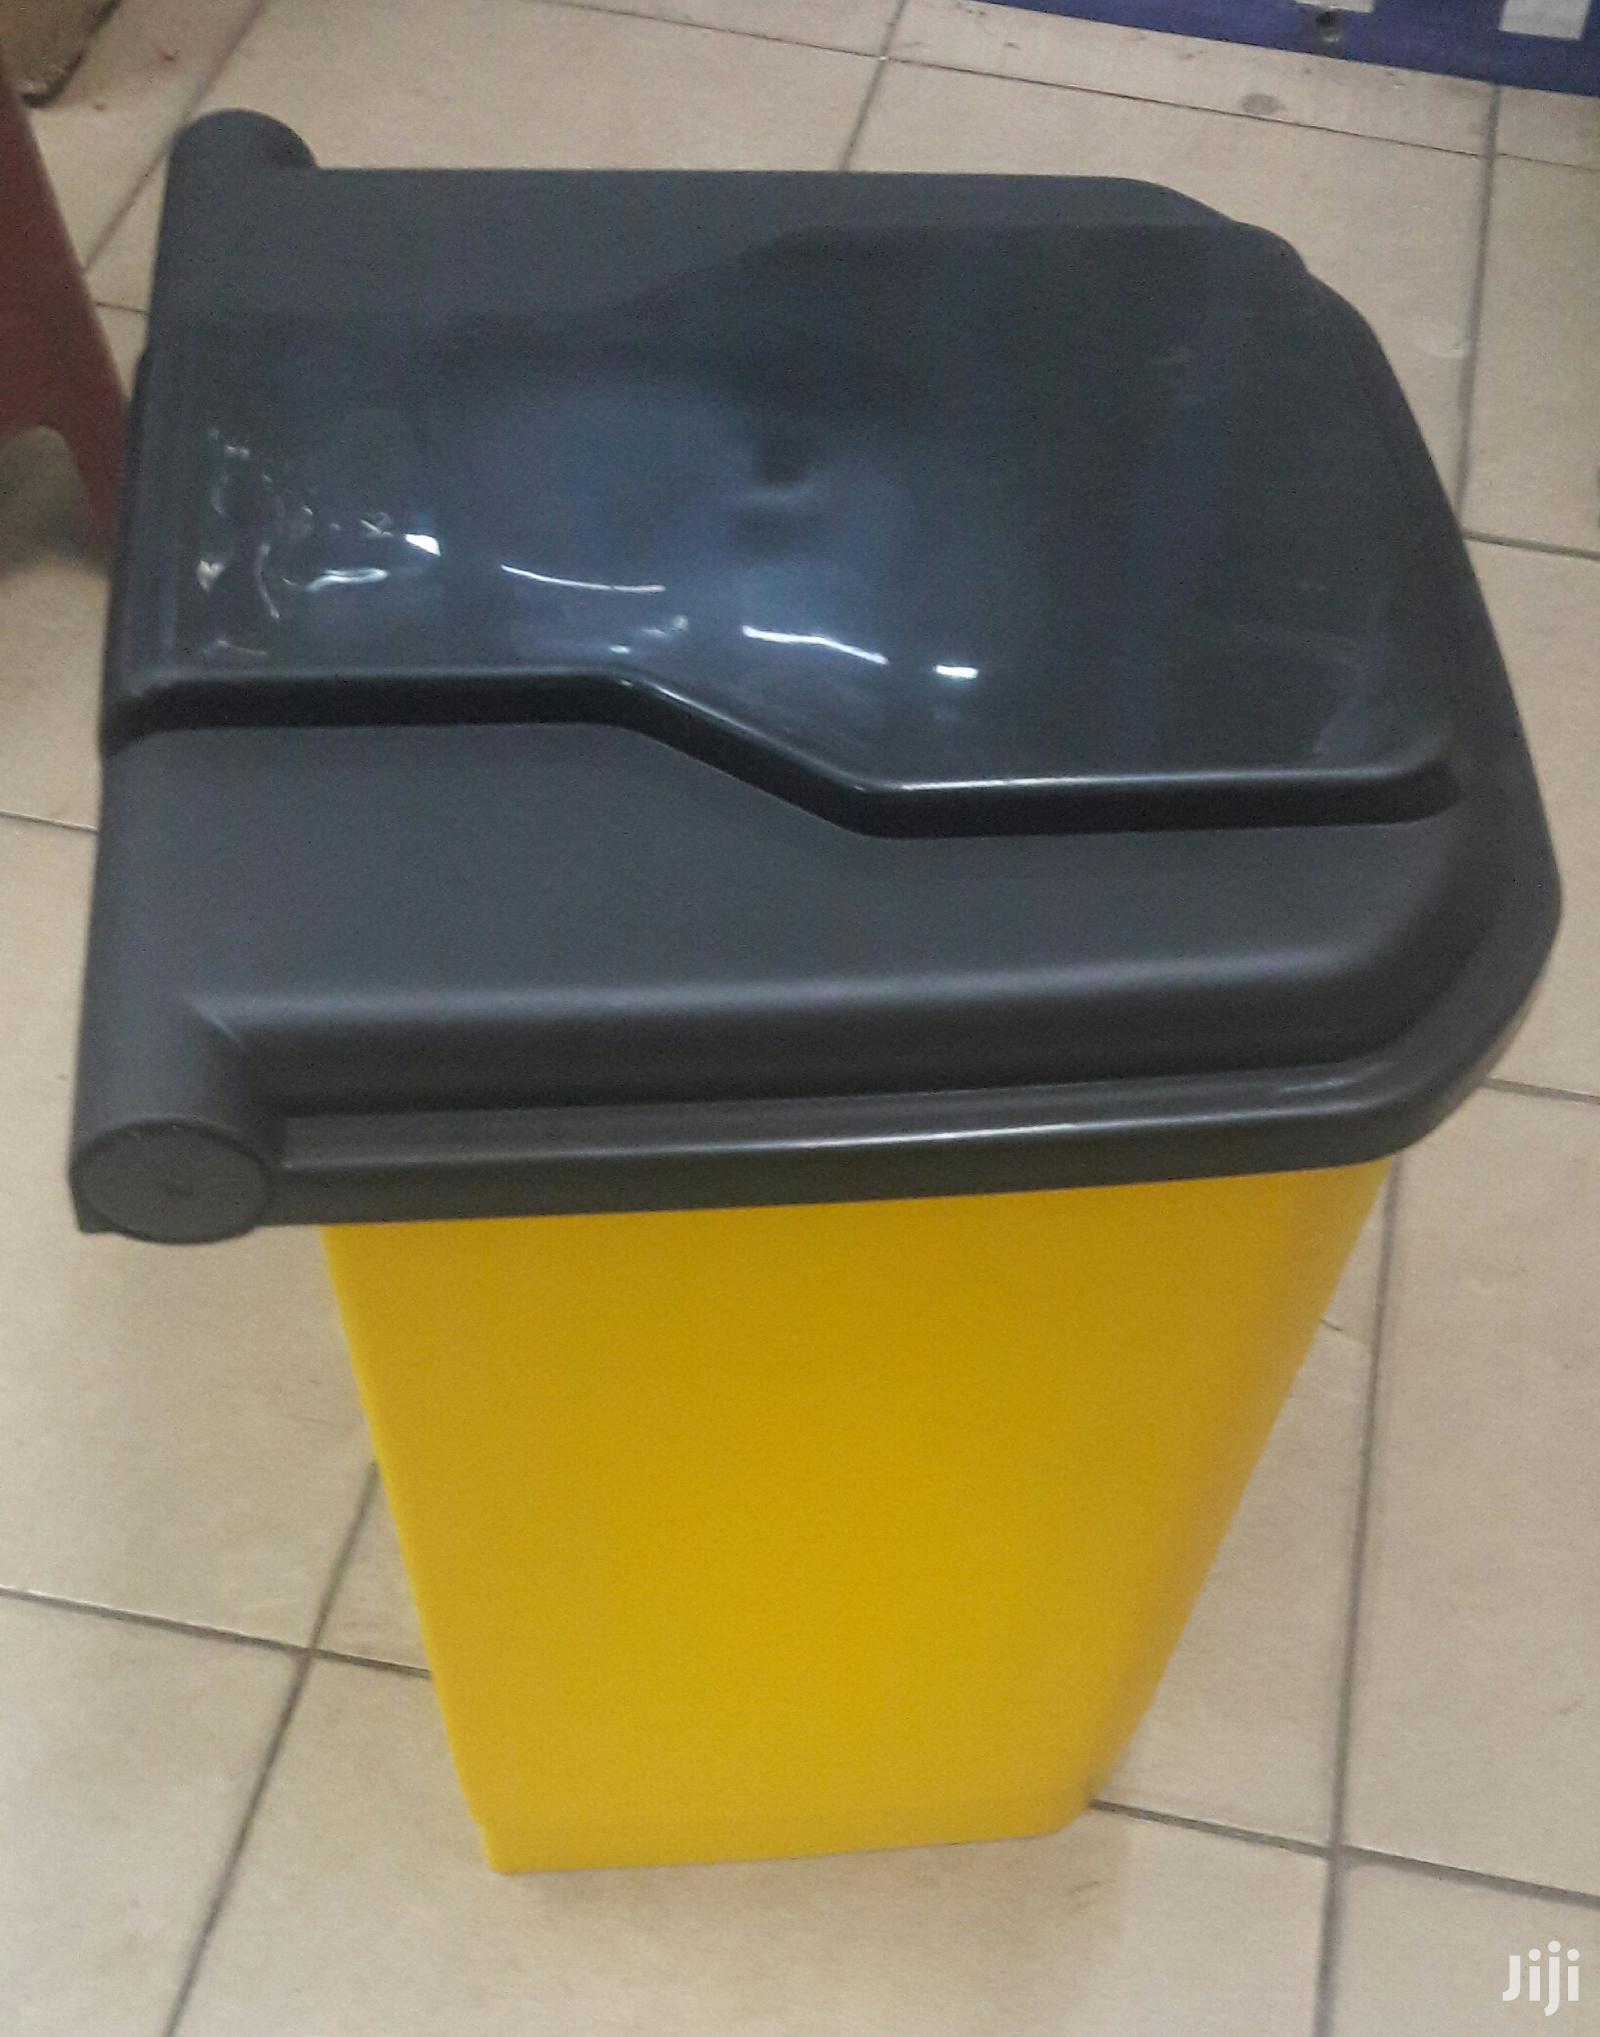 Pedal Dust Bin | Garden for sale in Nairobi Central, Nairobi, Kenya